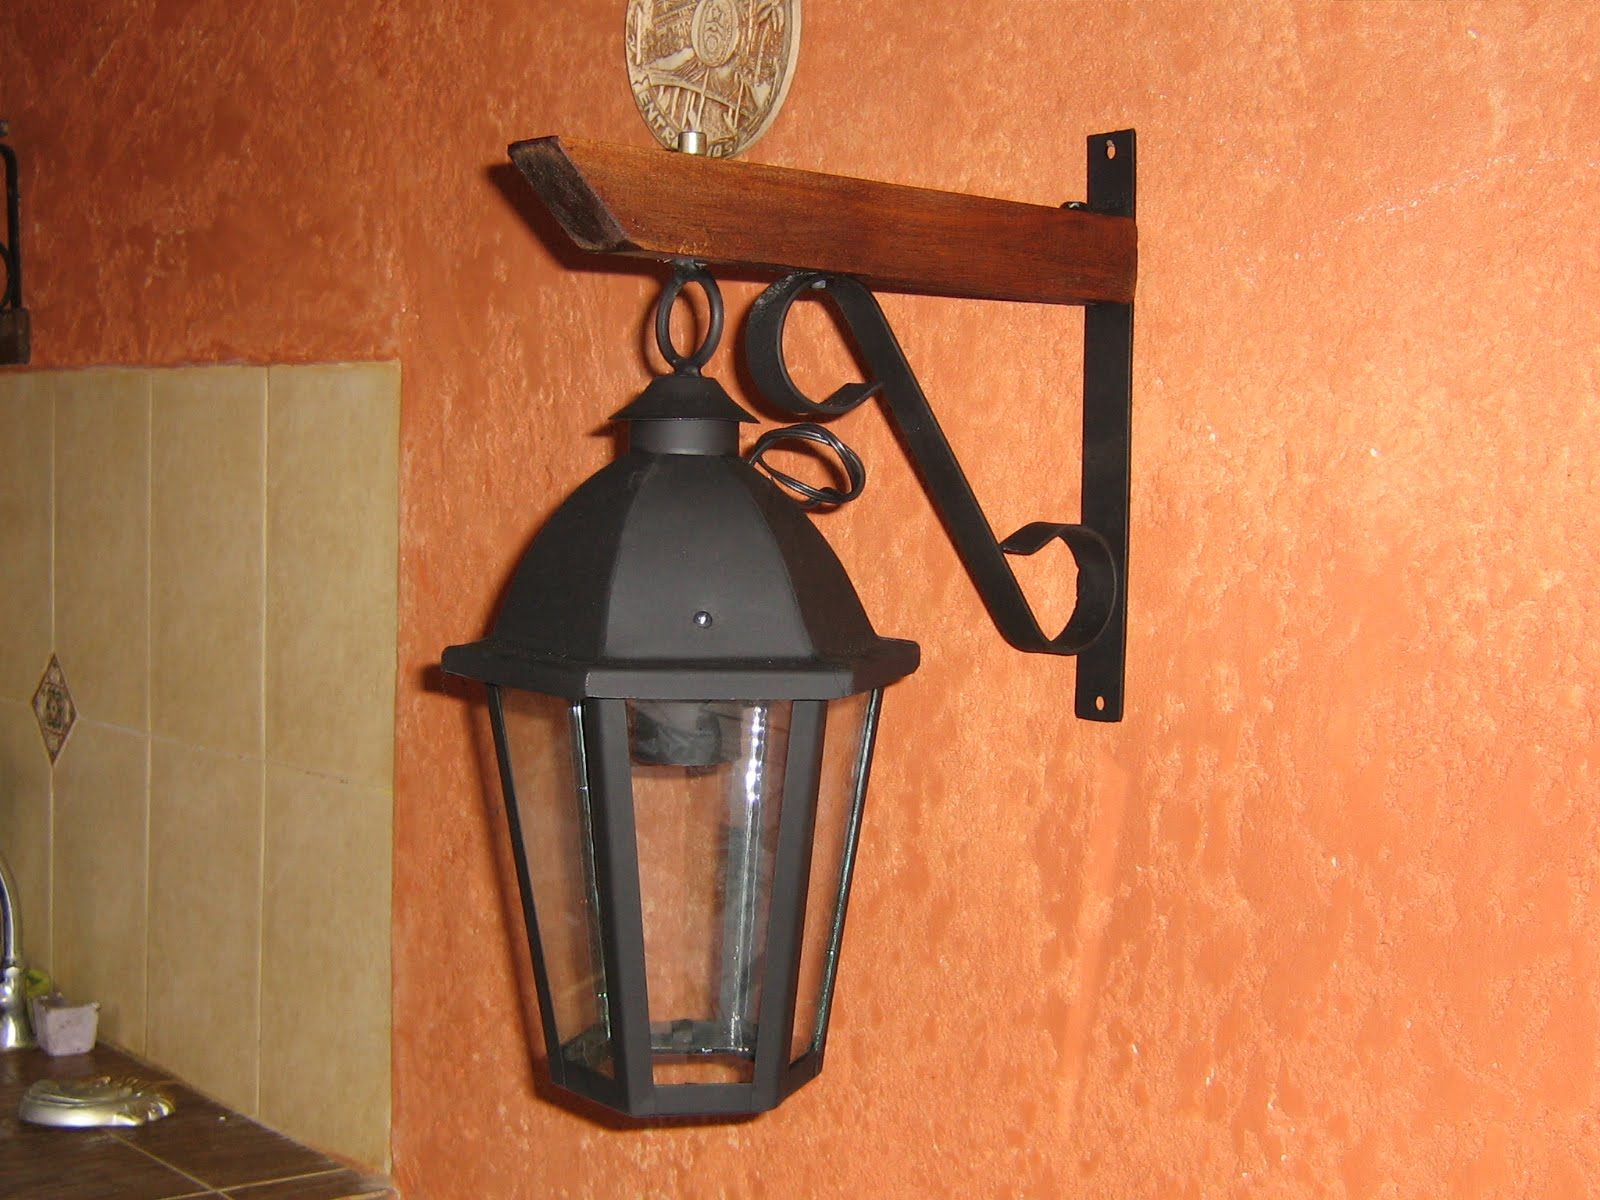 Herreria el vasco herreria el vasco muebles en hierro y for Muebles industriales madera y hierro